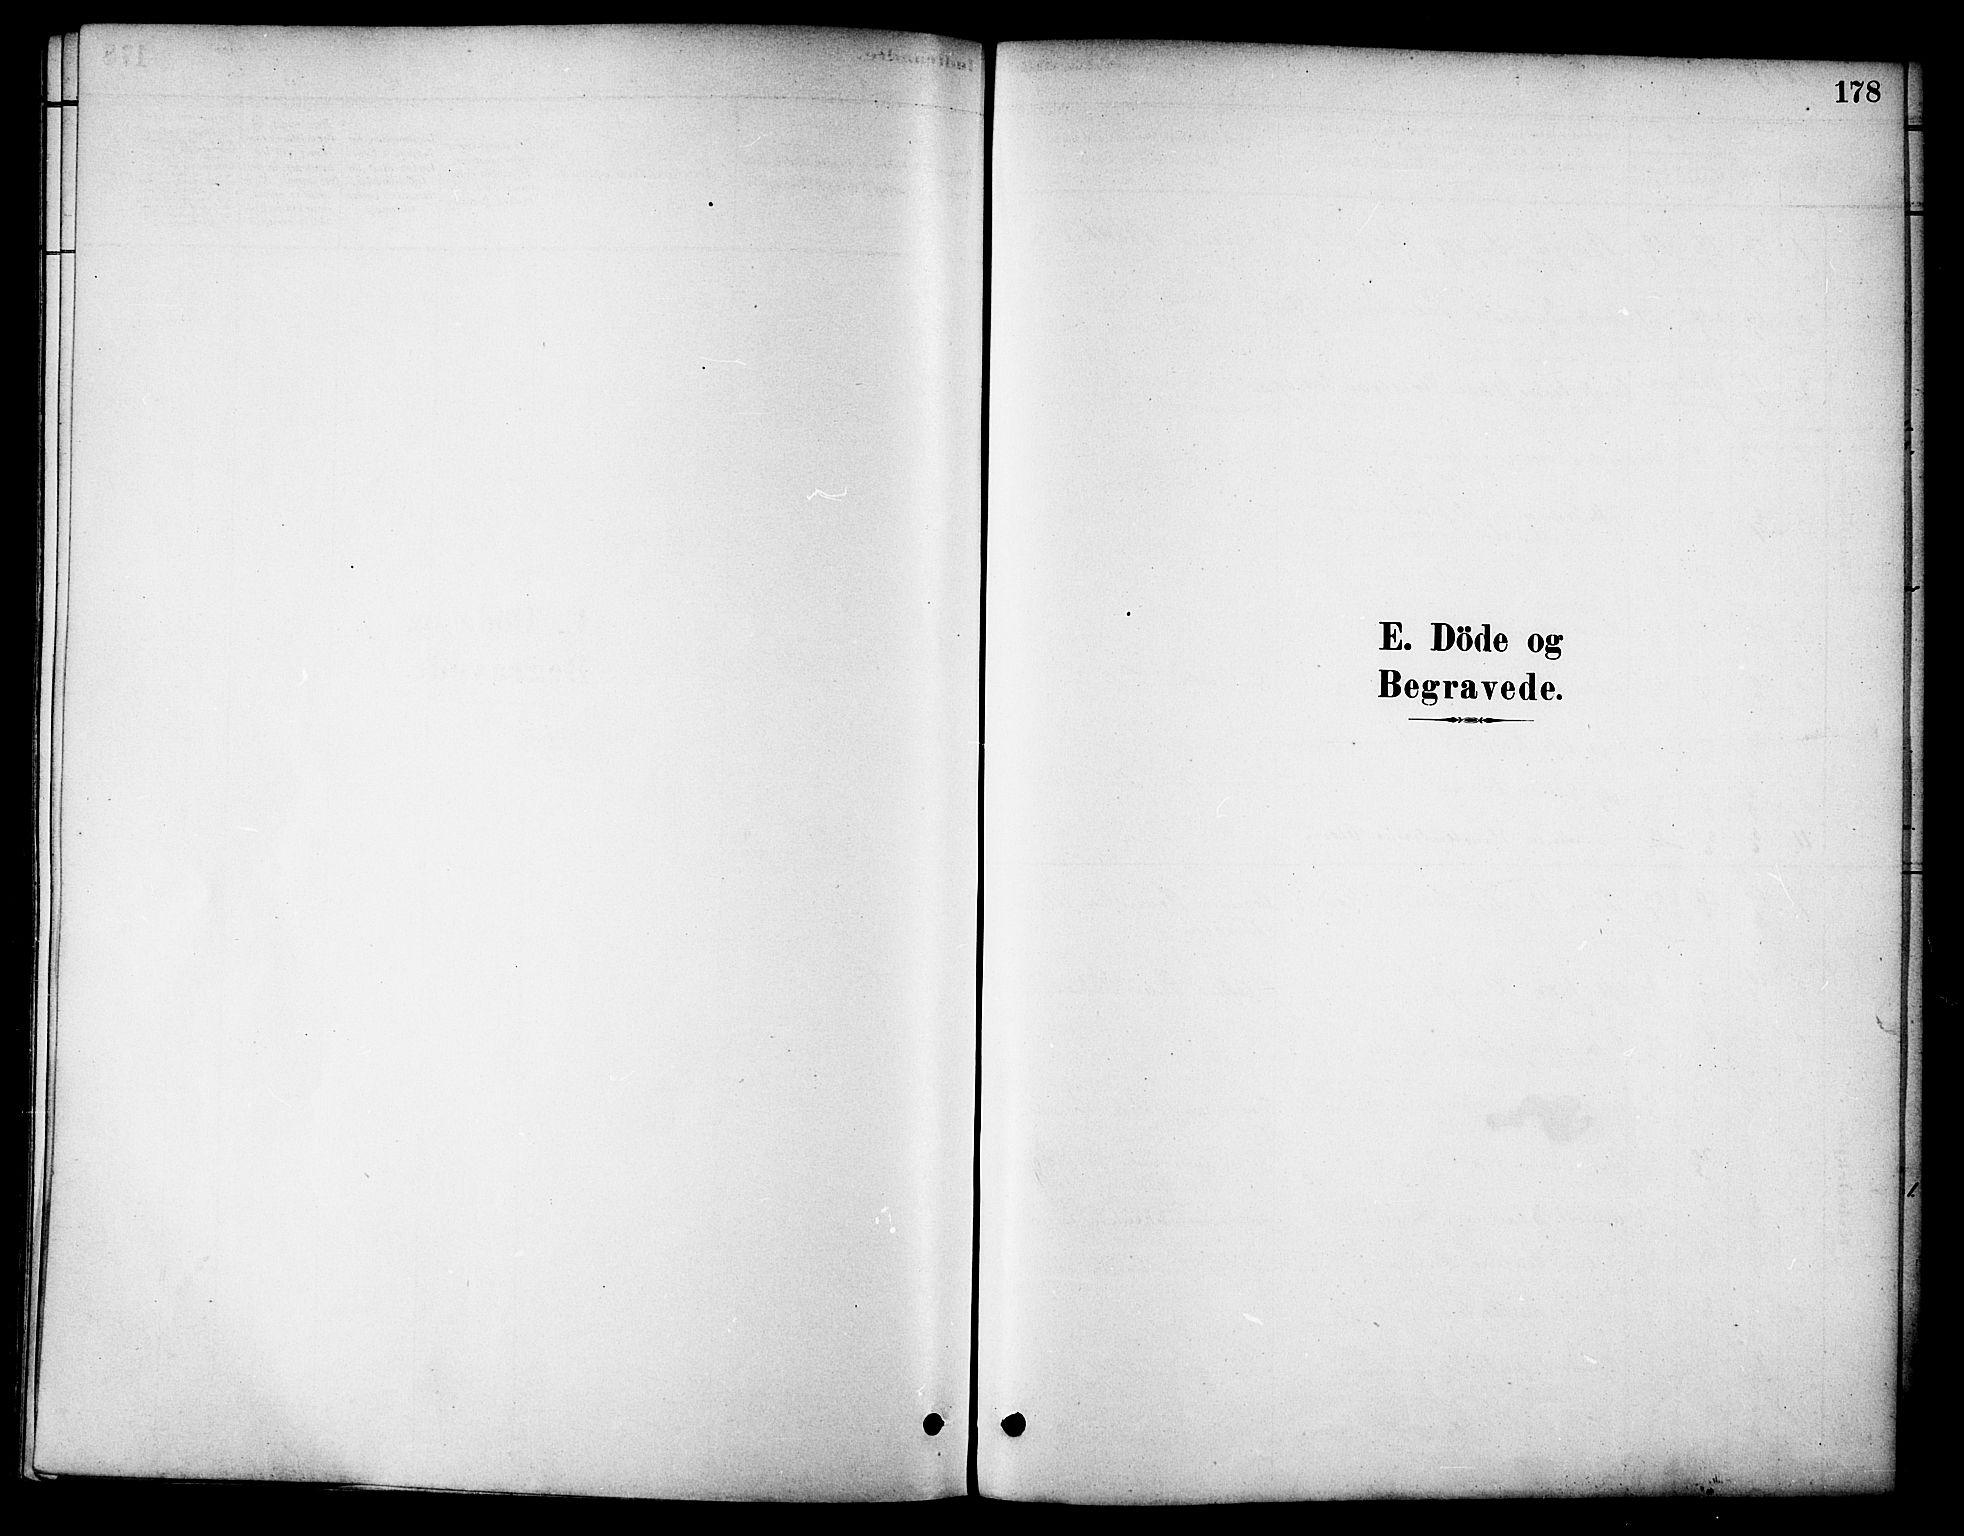 SAT, Ministerialprotokoller, klokkerbøker og fødselsregistre - Nordland, 801/L0030: Klokkerbok nr. 801C05, 1879-1887, s. 178